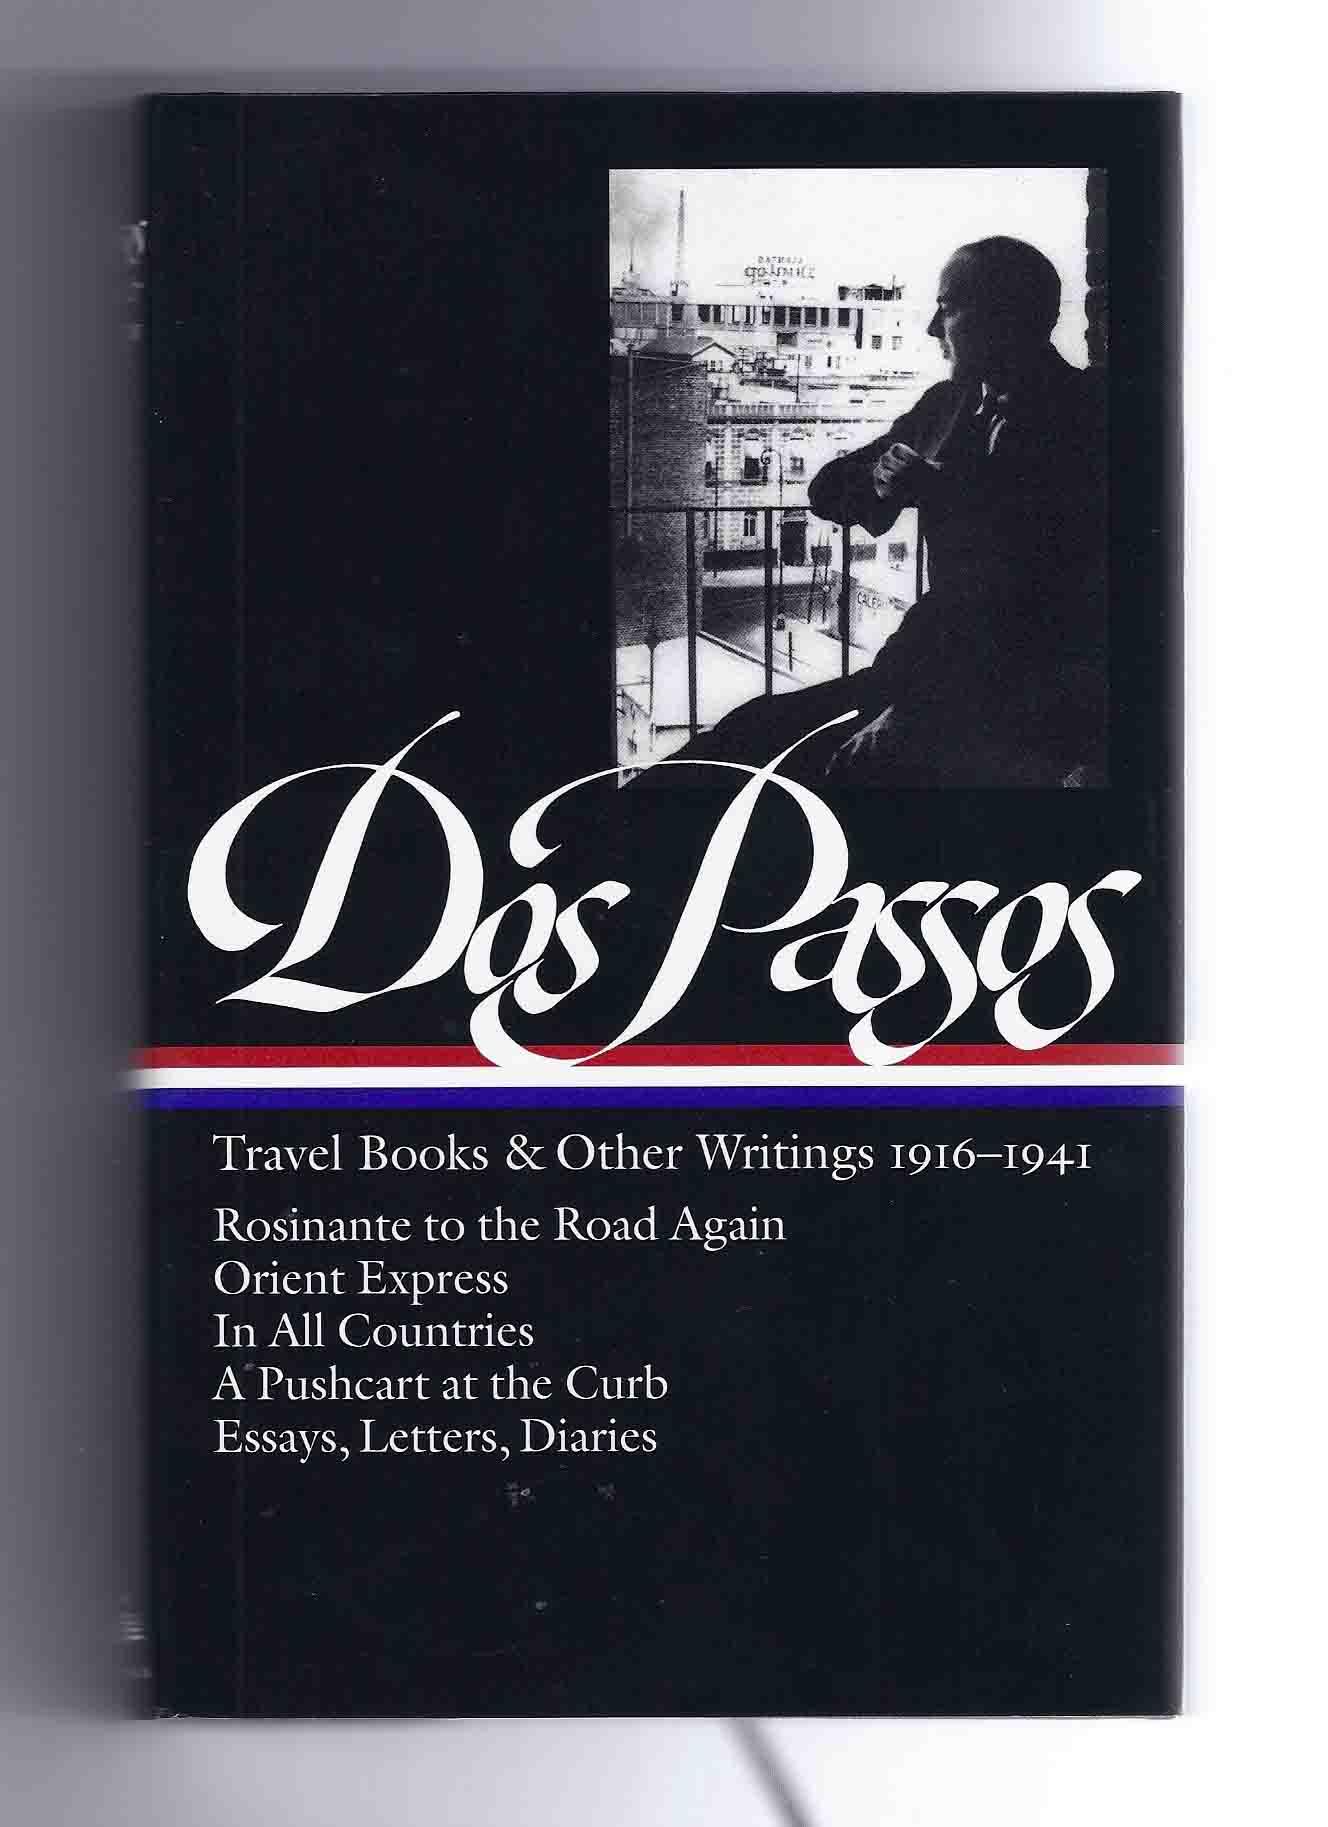 DosPassos